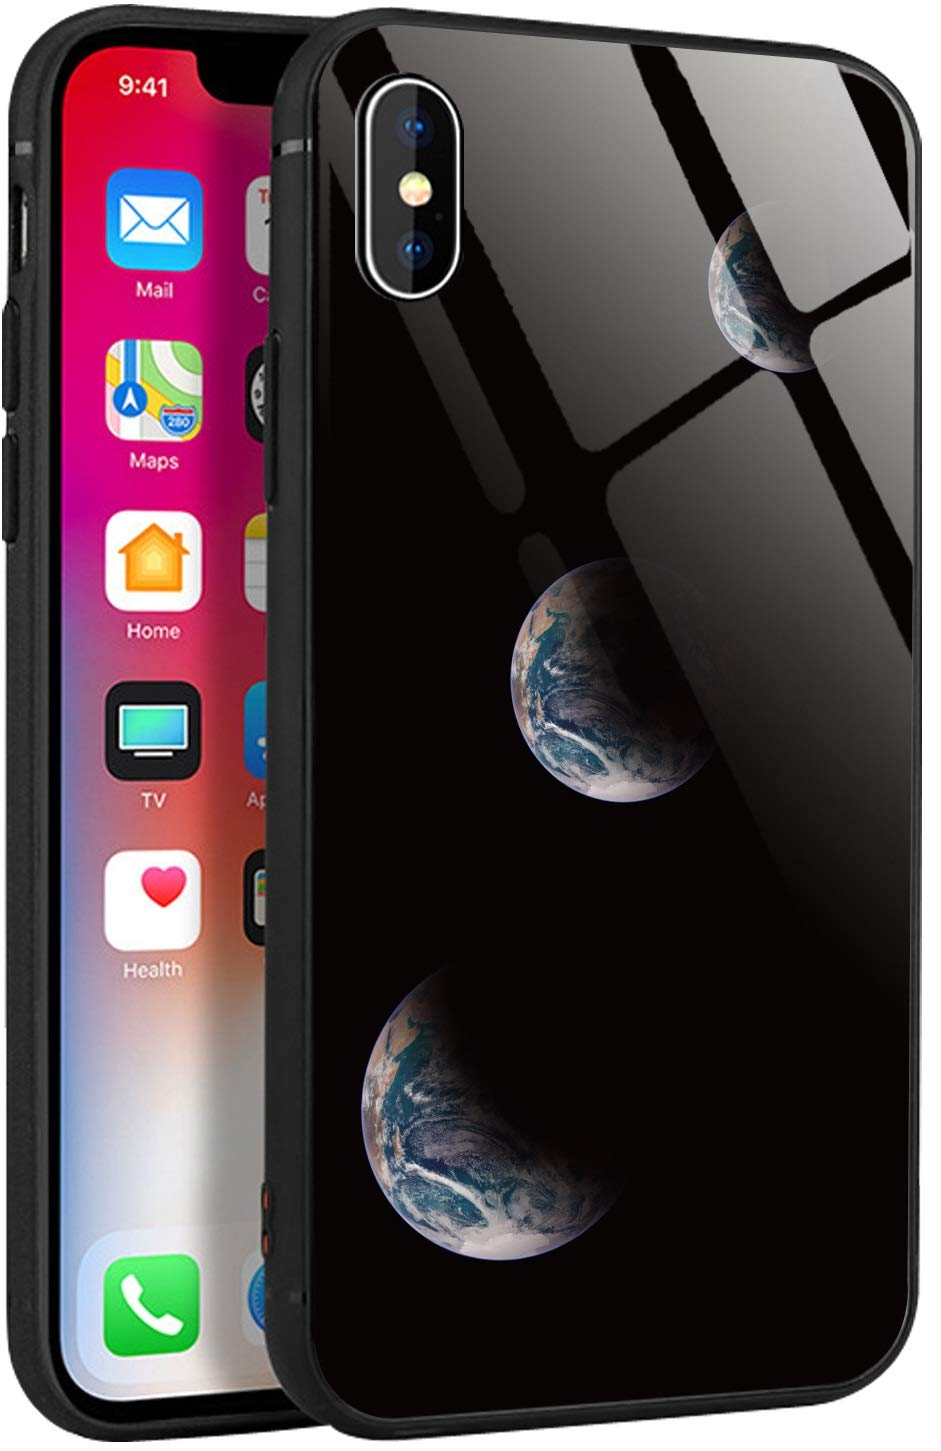 Eclipse Handyhülle kompatibel mit iPhone,Tempered Glass Back Phone case (iPhone X/XS, iPhone 7/8 & iPhoneXR)